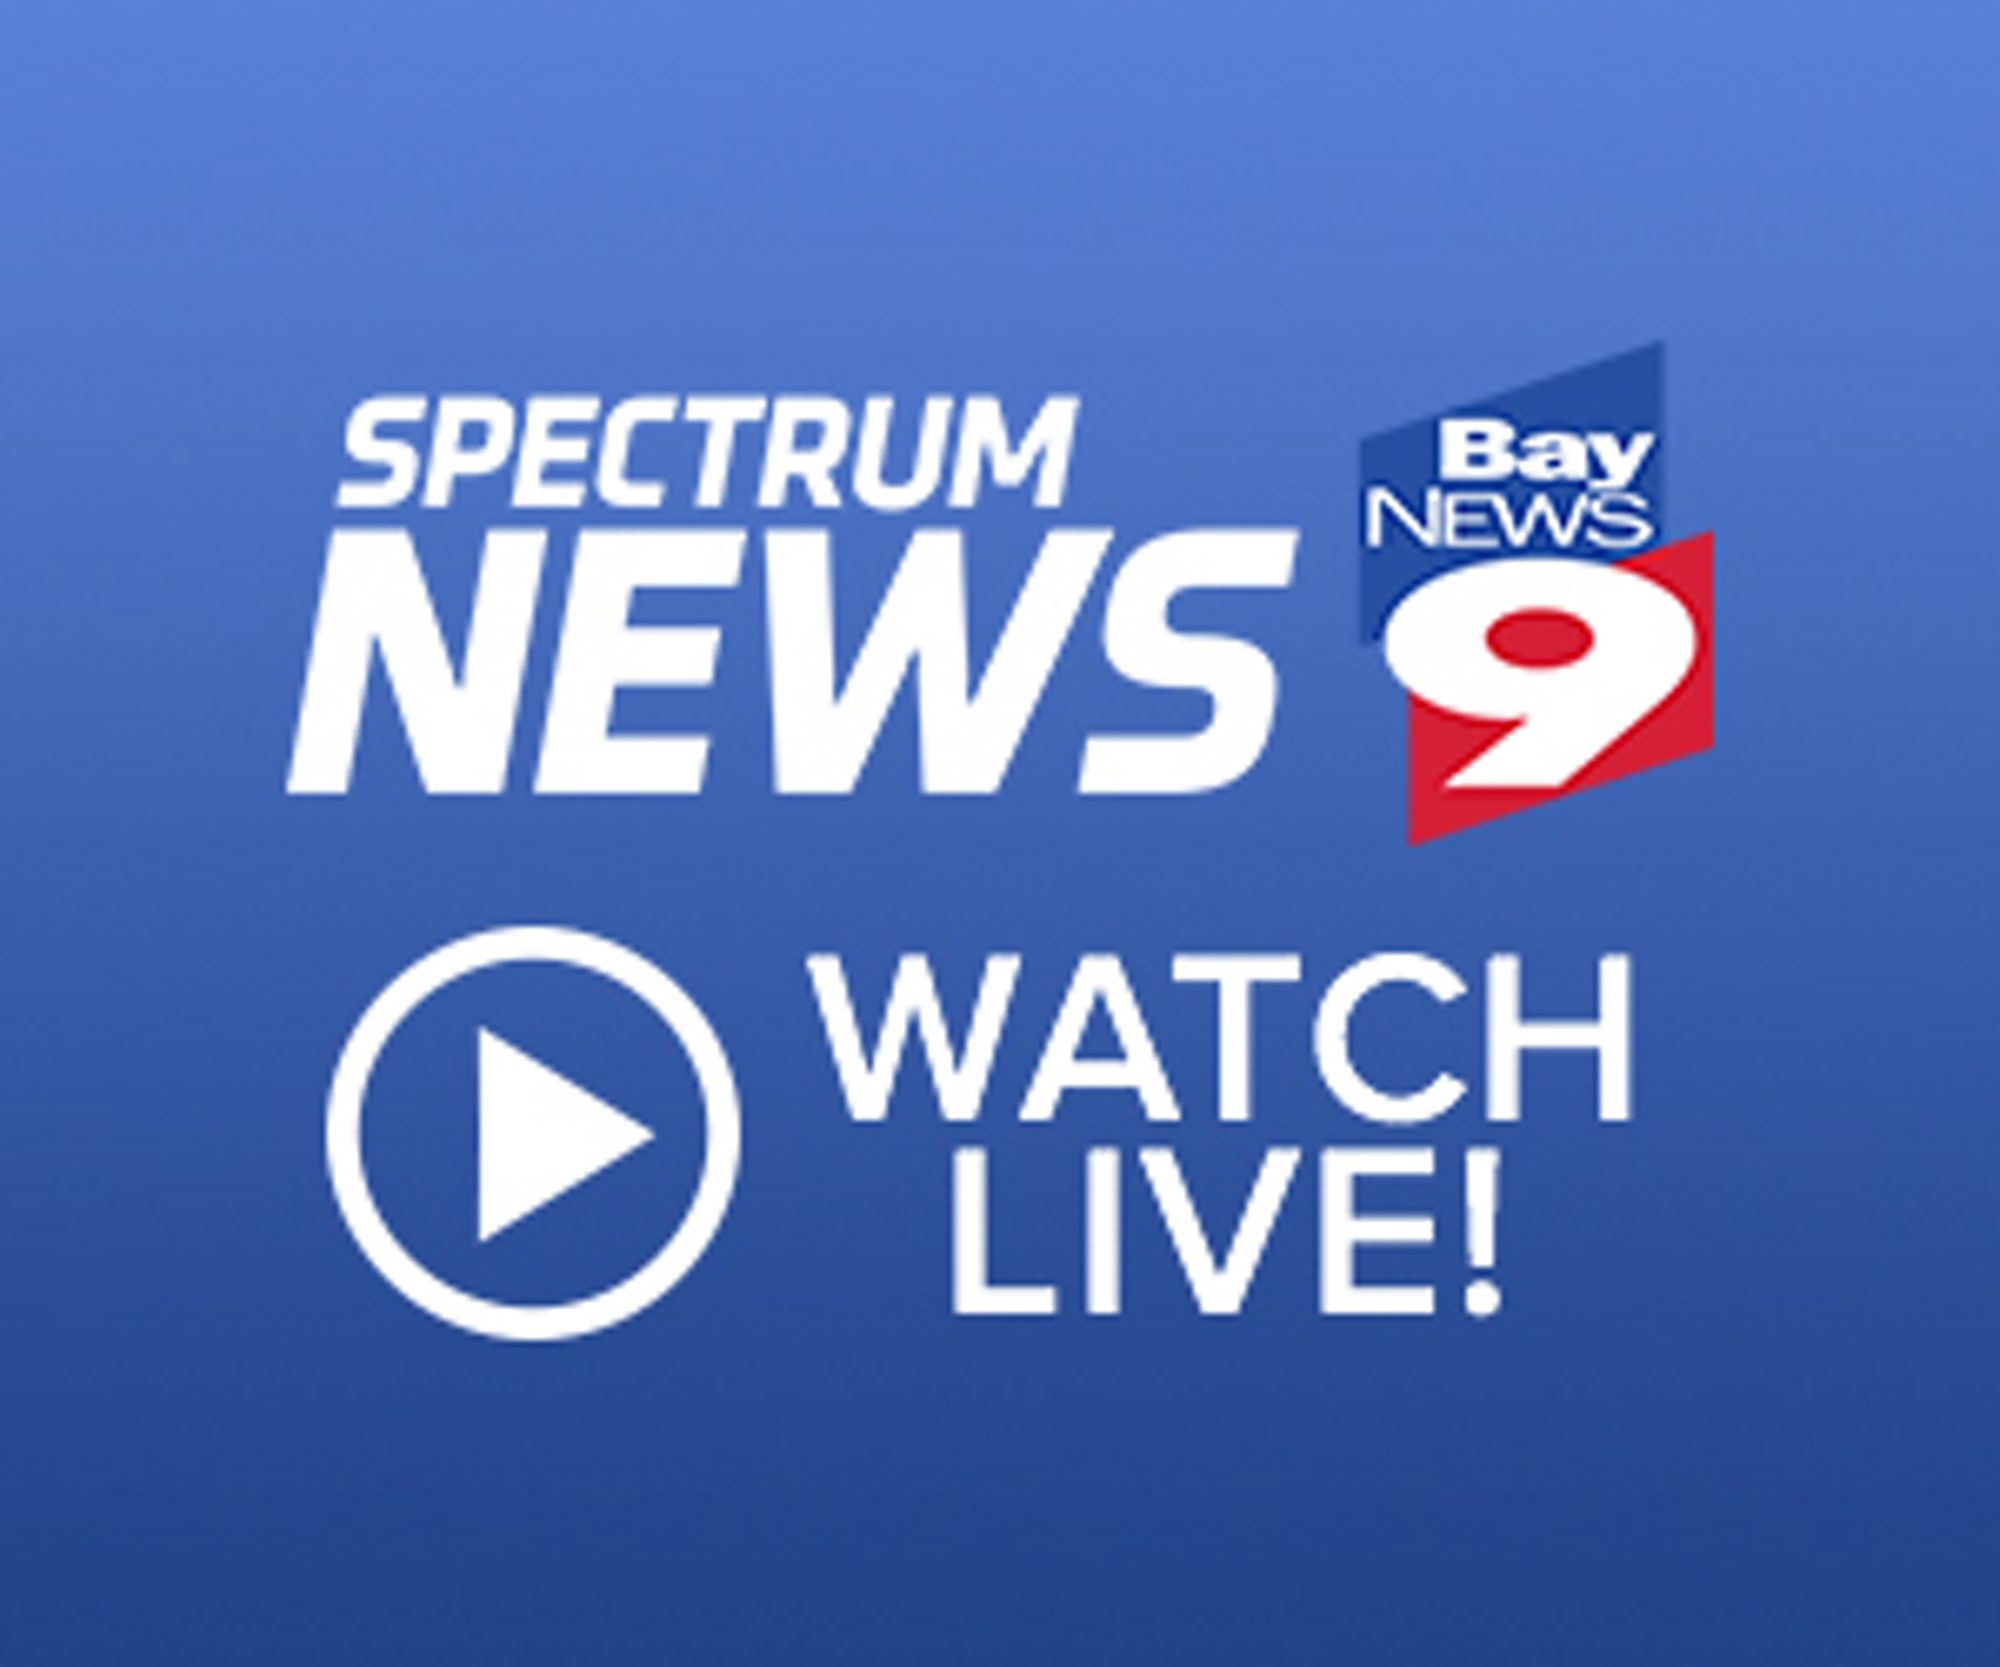 Spectrum News | Bay News 9